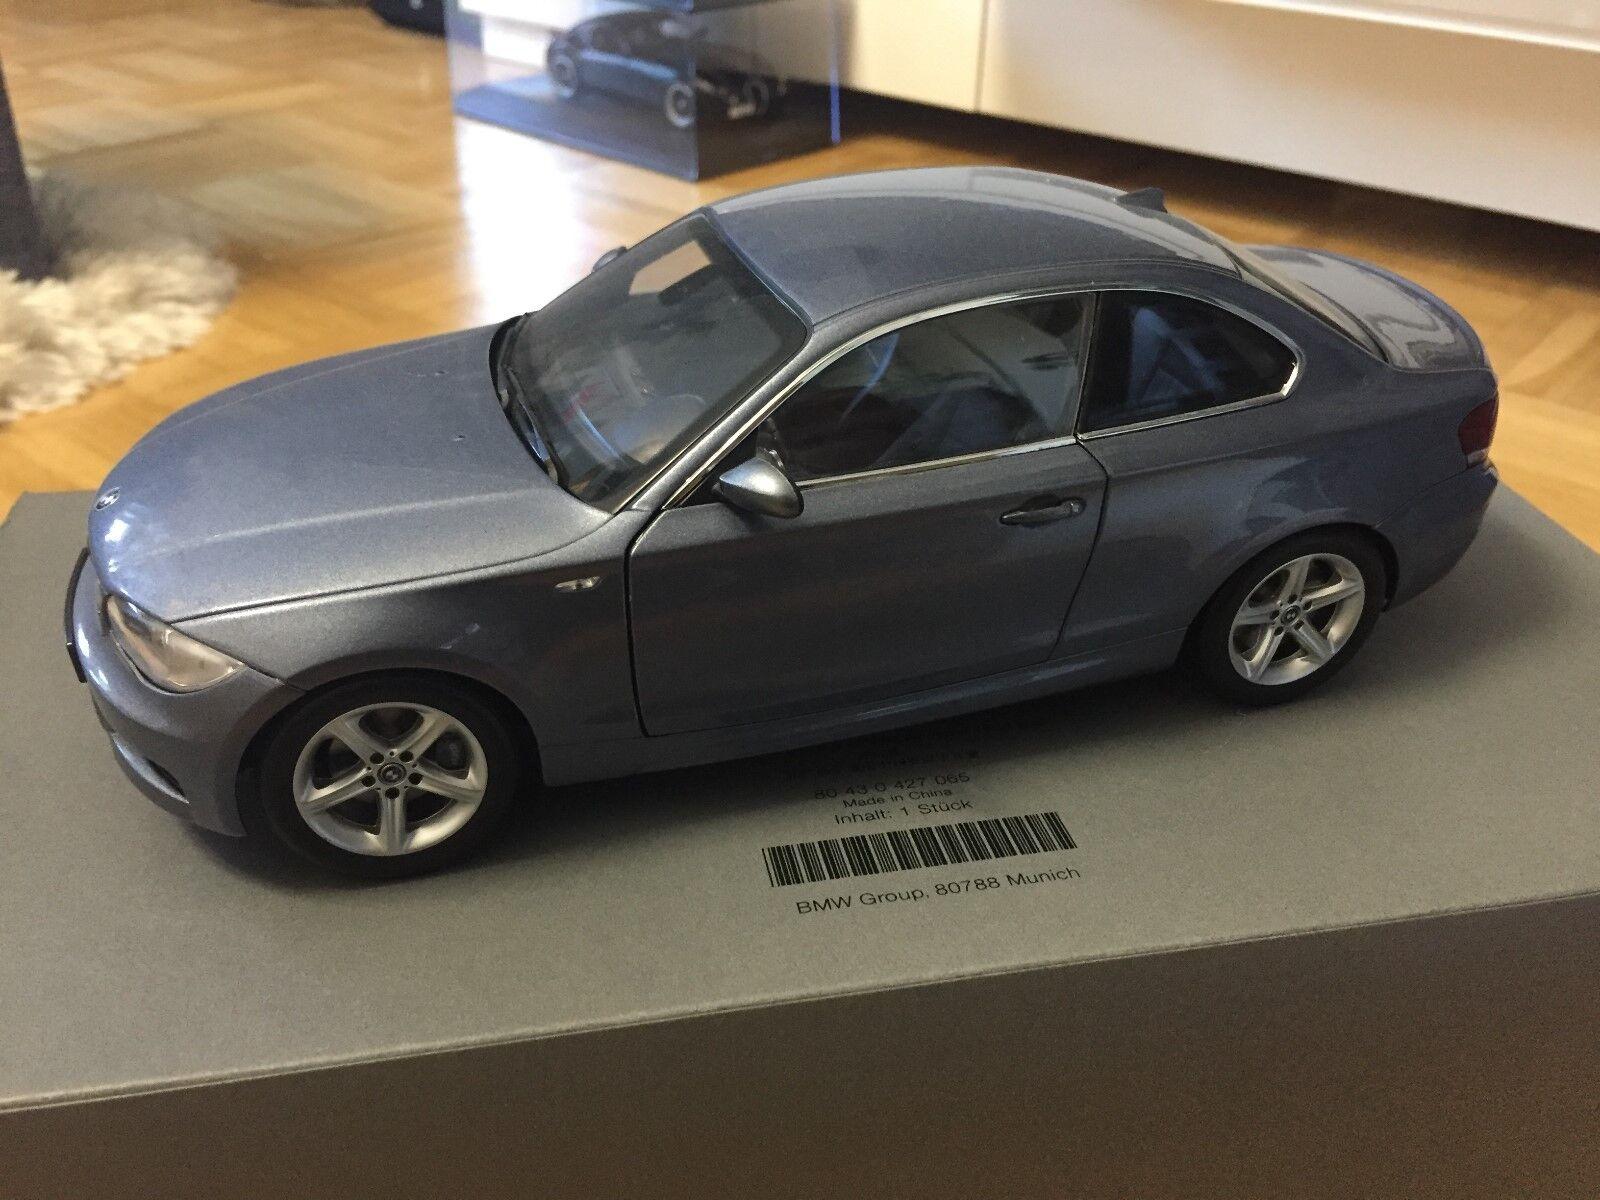 BMW 1er COUPE Cristallo Blu 1 18 KYOSHO